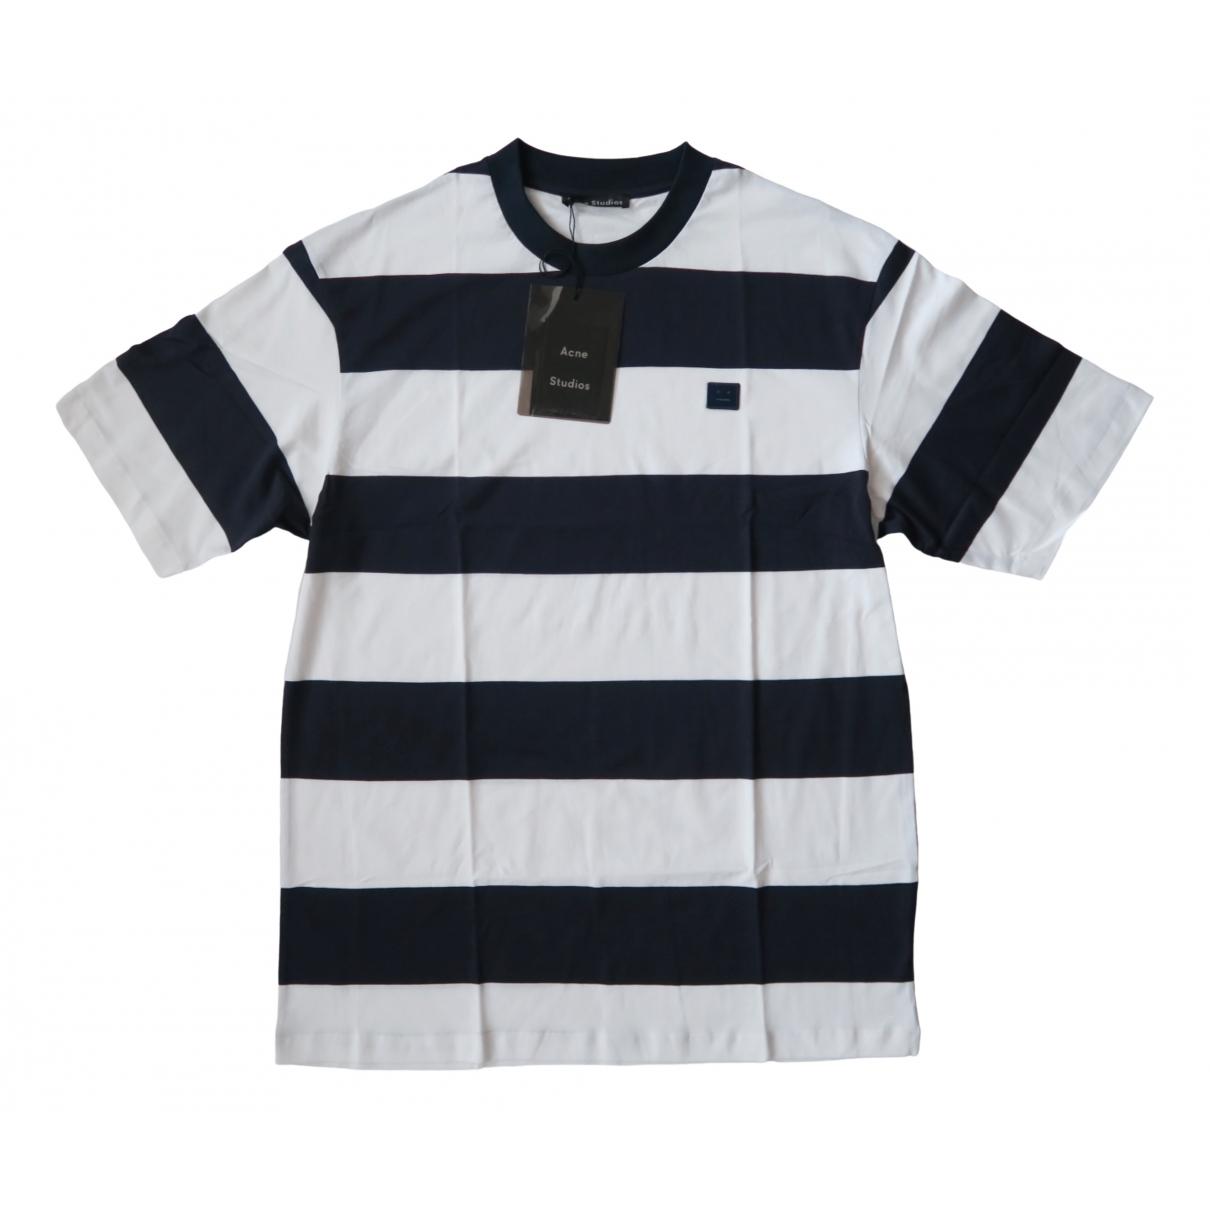 Acne Studios \N White Cotton T-shirts for Men M International